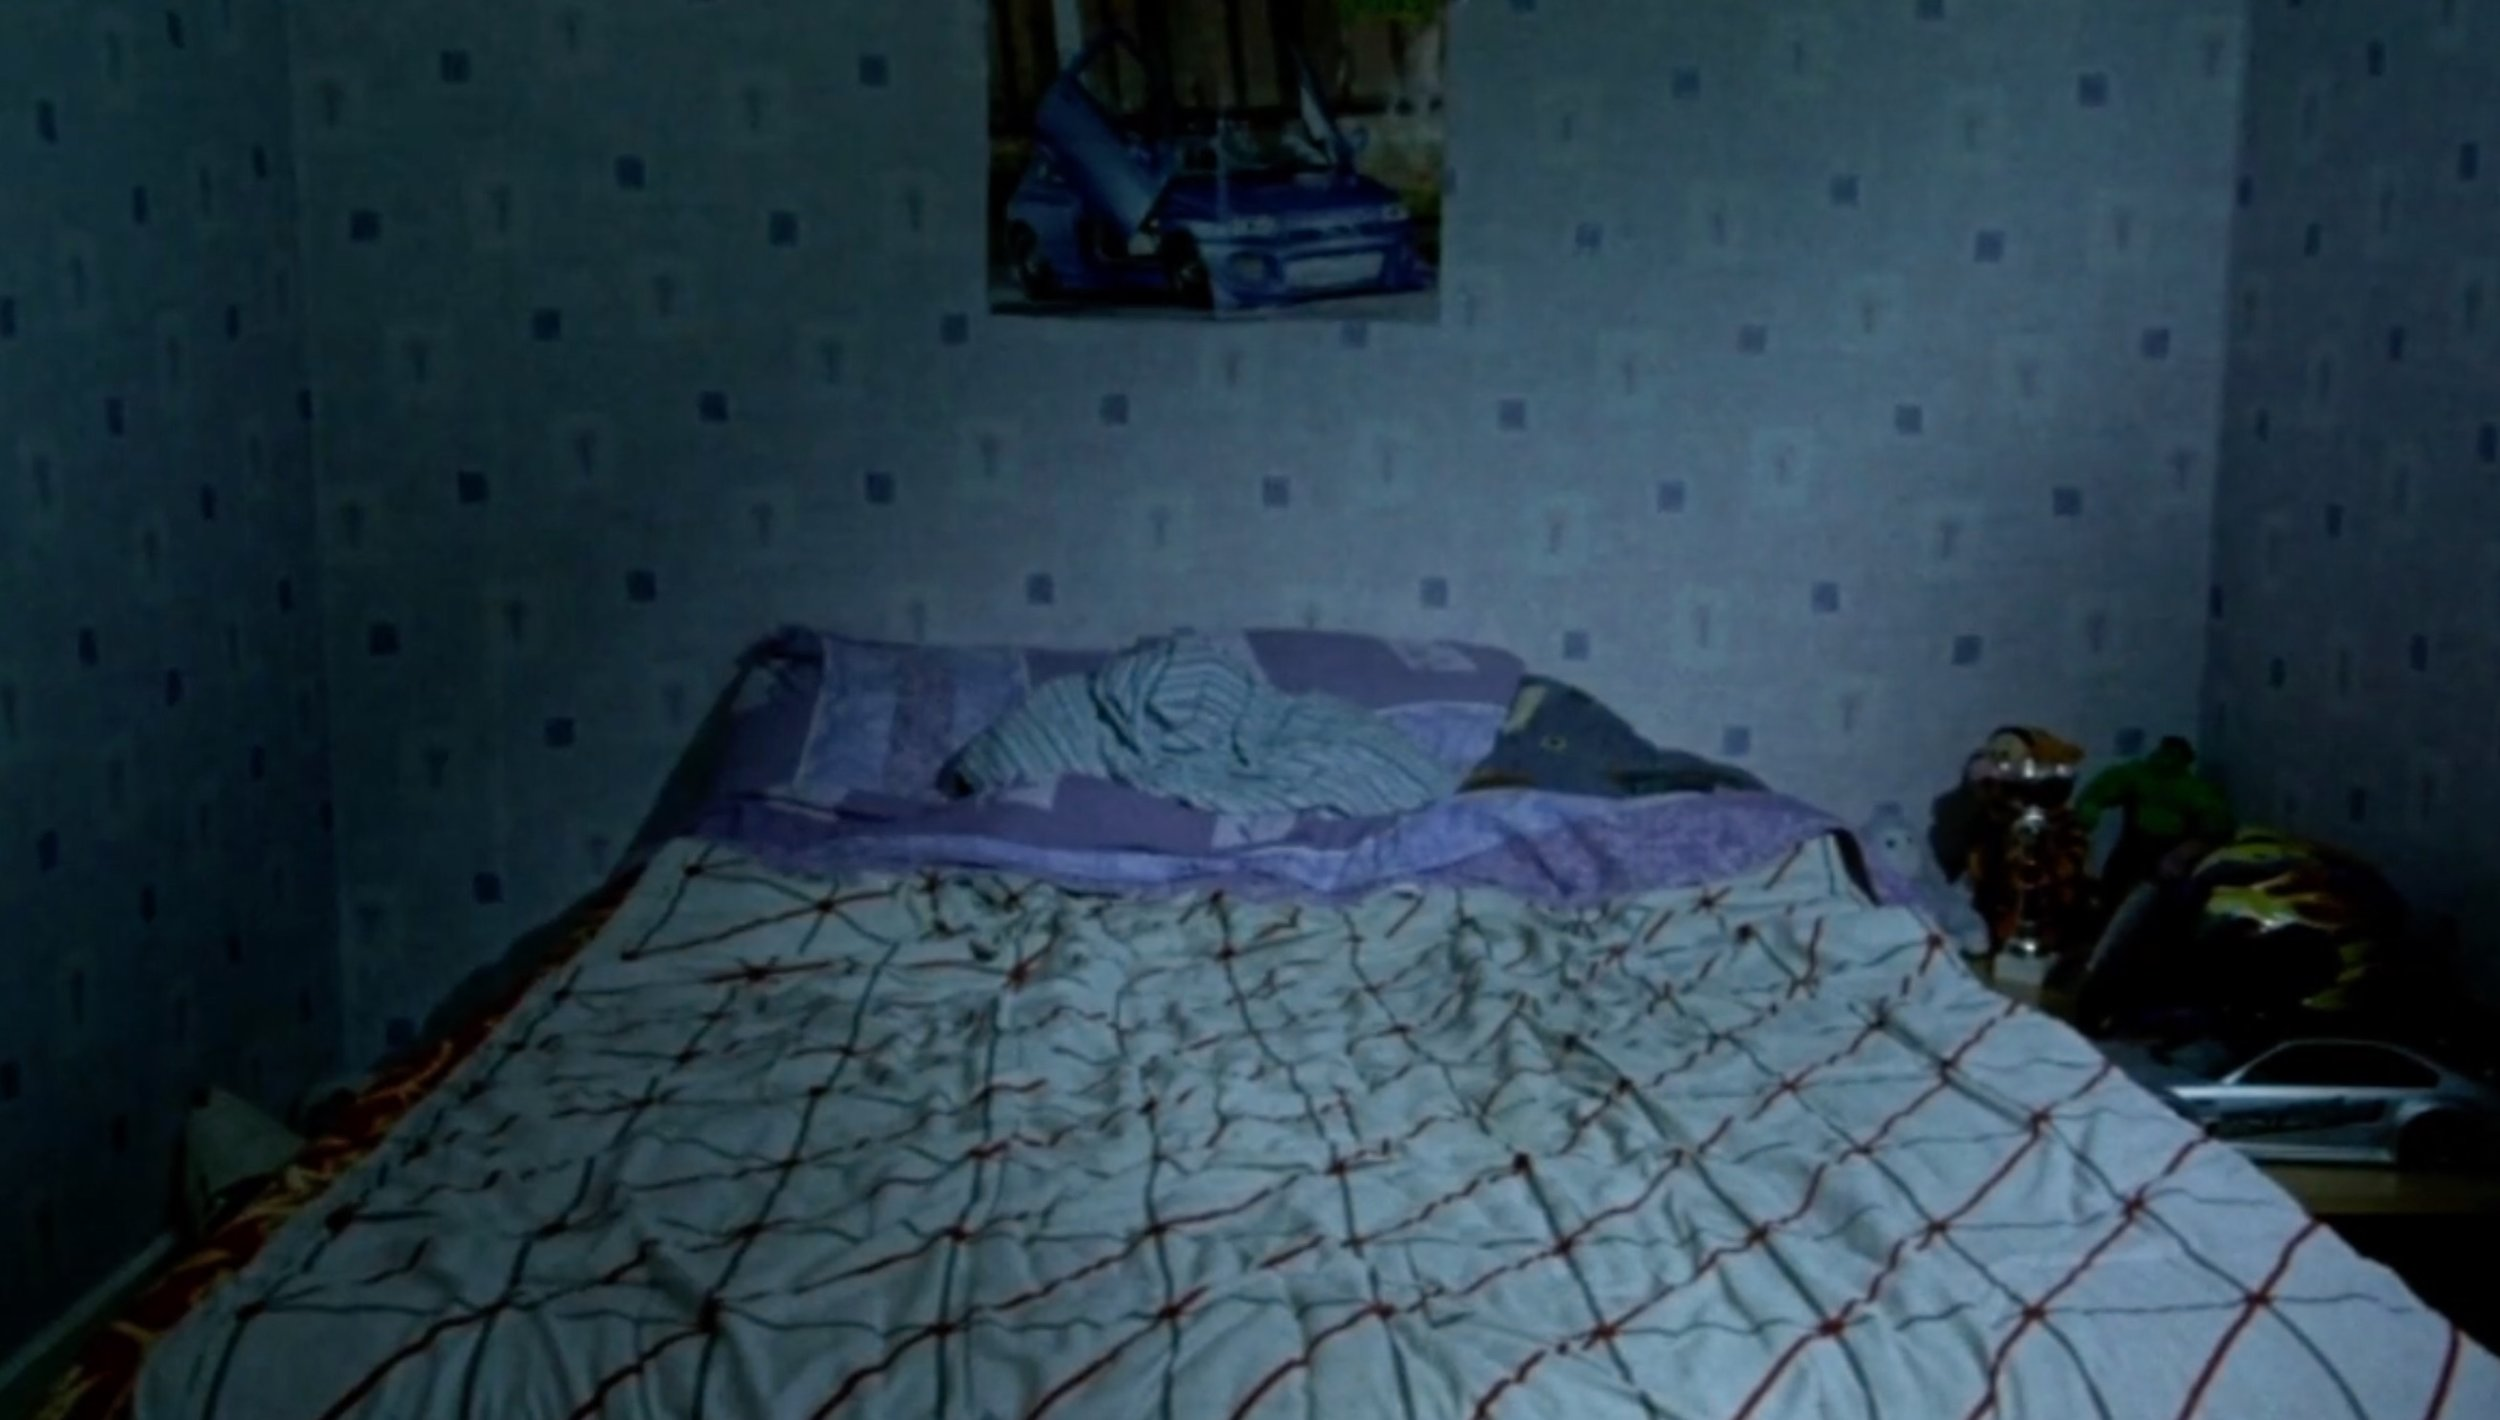 Image from Romaine Gavras video - Signatune